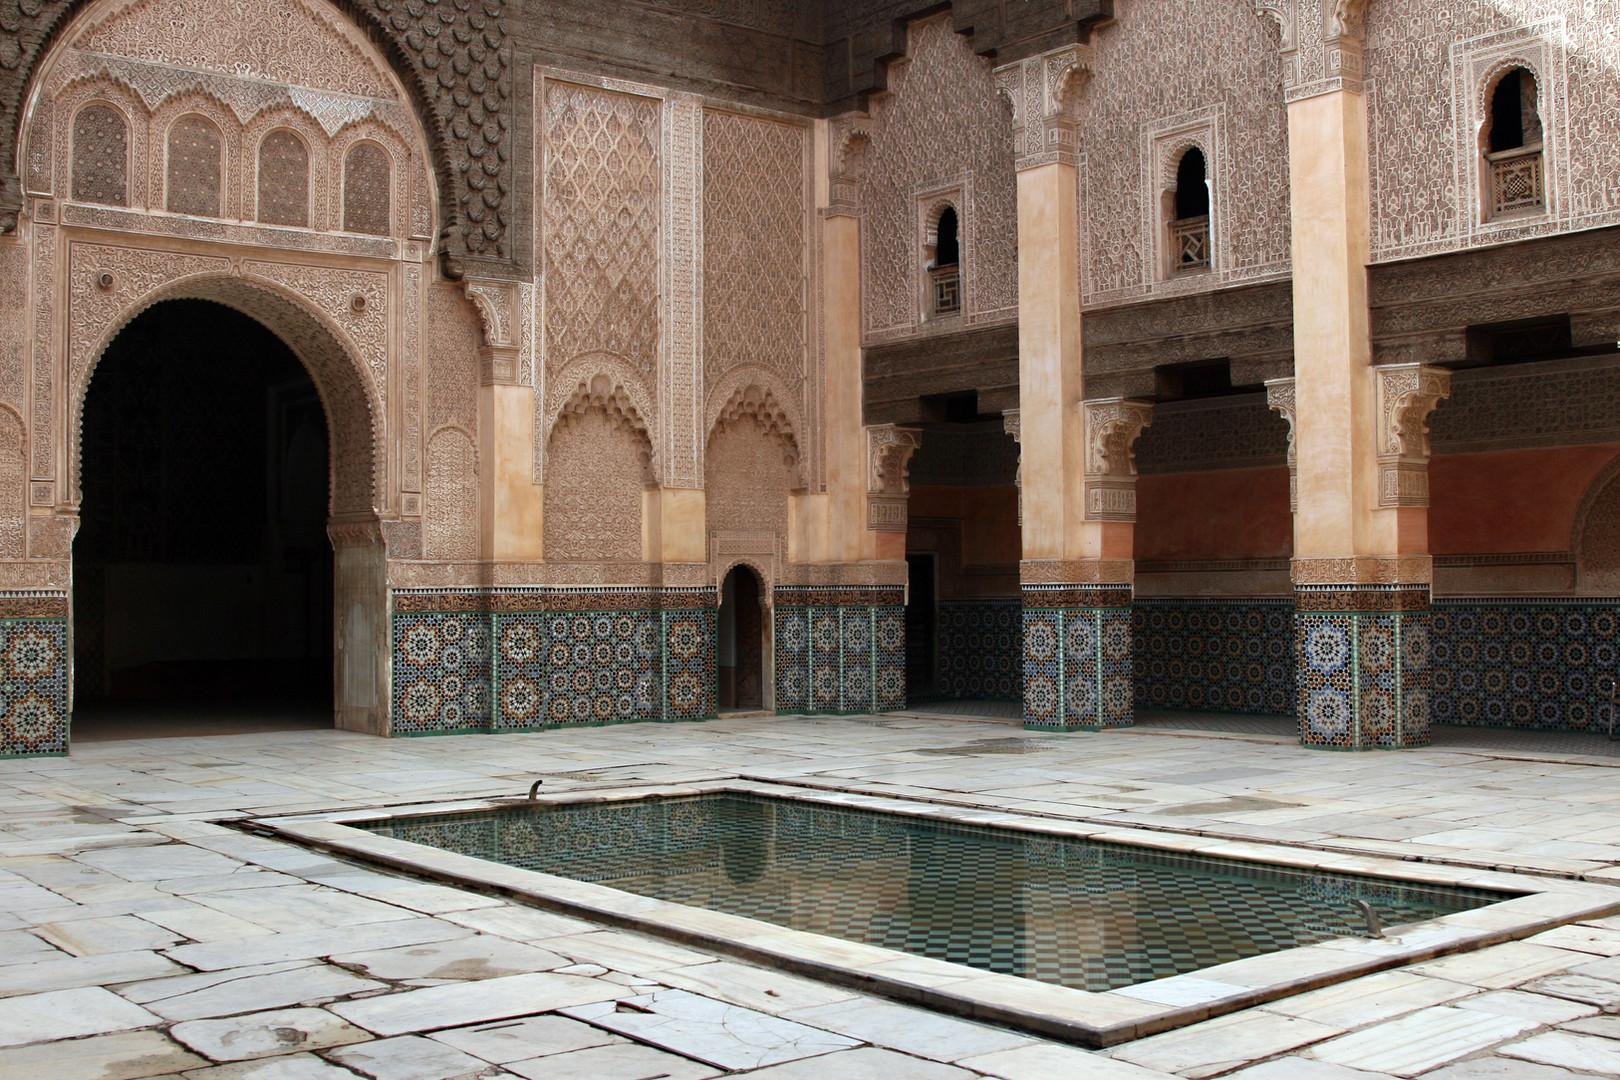 A Mosque Courtyard